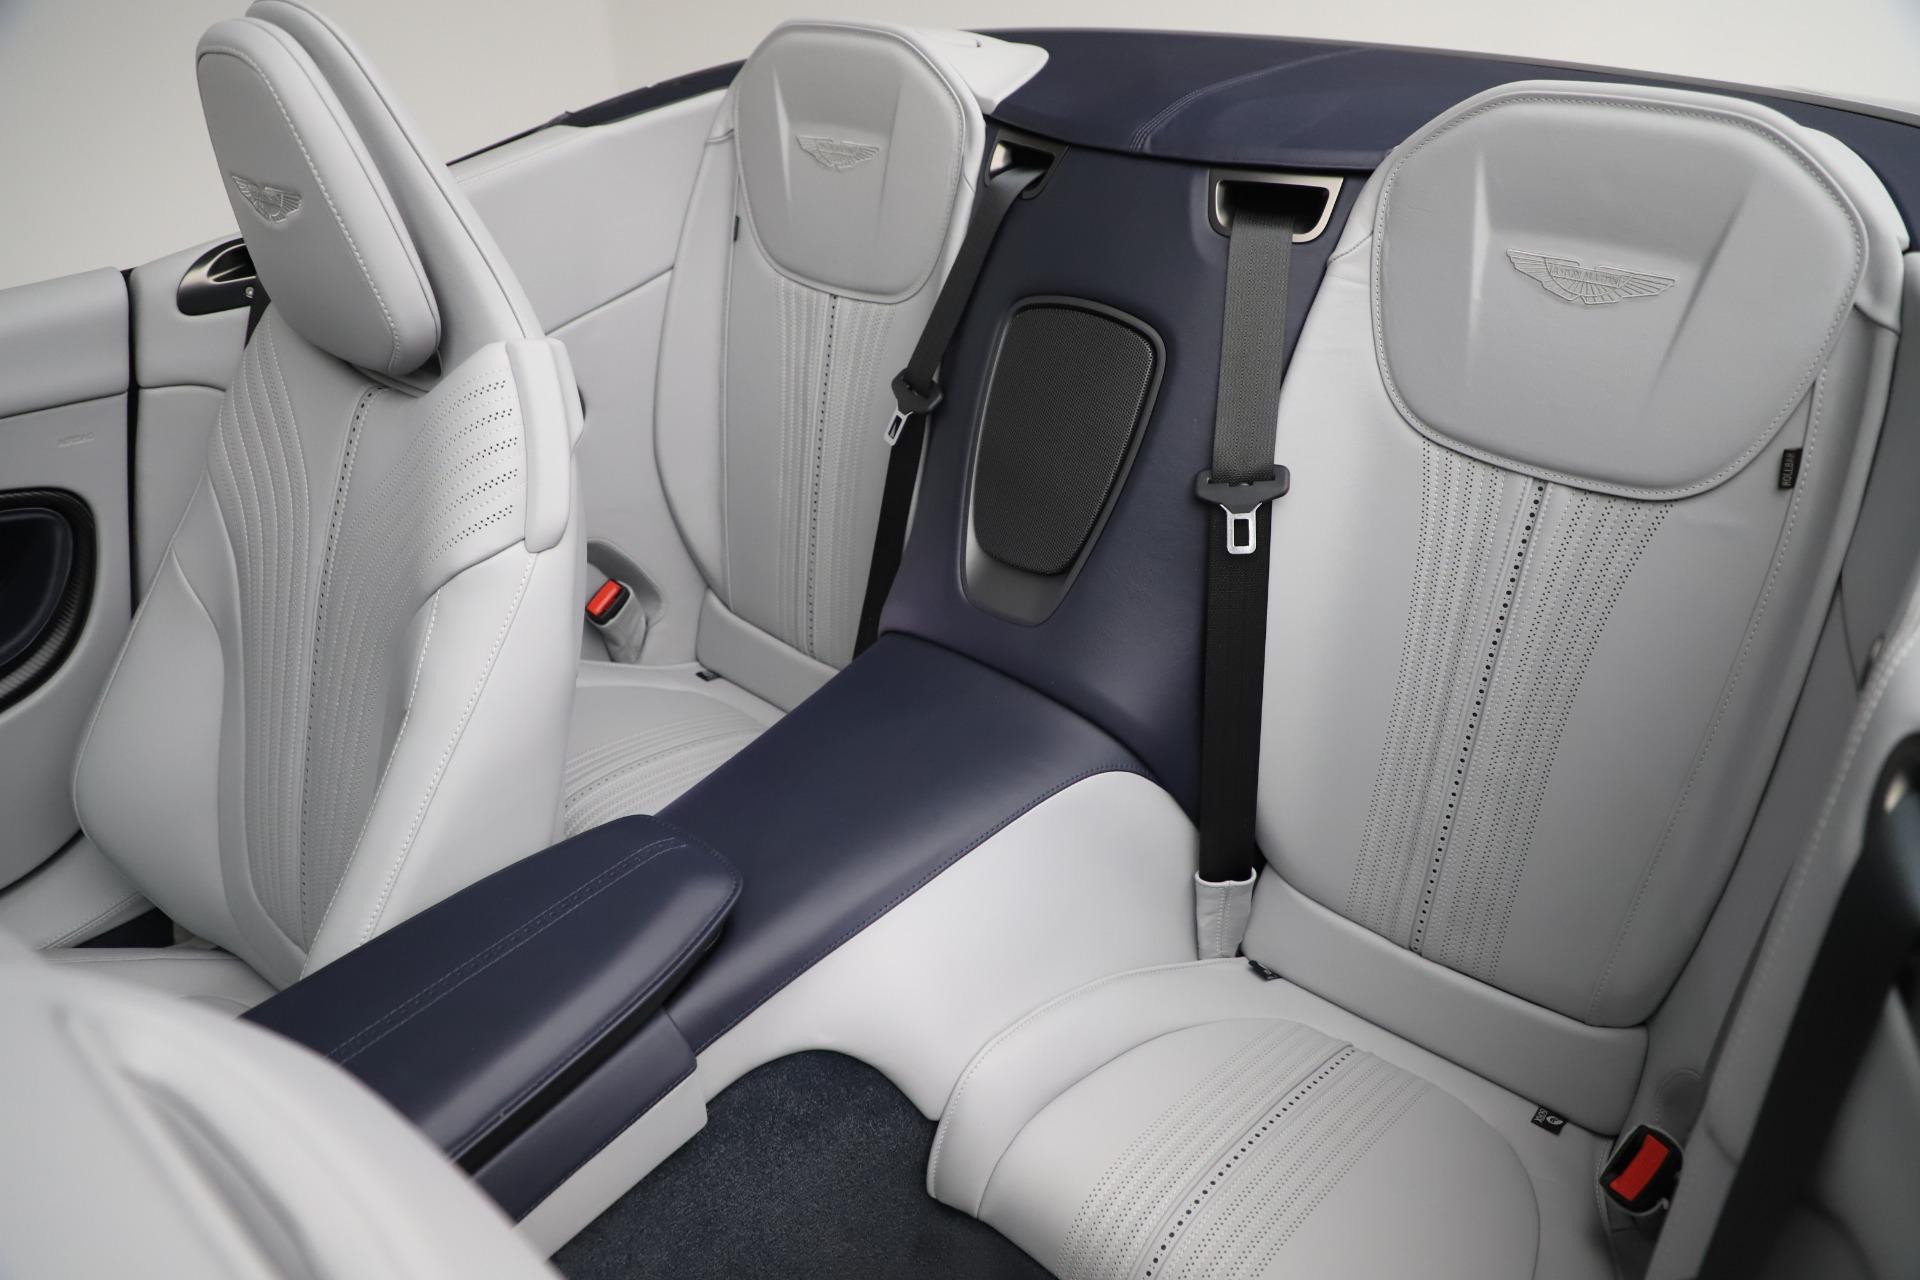 New 2020 Aston Martin Db11 Volante Convertible For Sale Special Pricing Aston Martin Of Greenwich Stock A1463